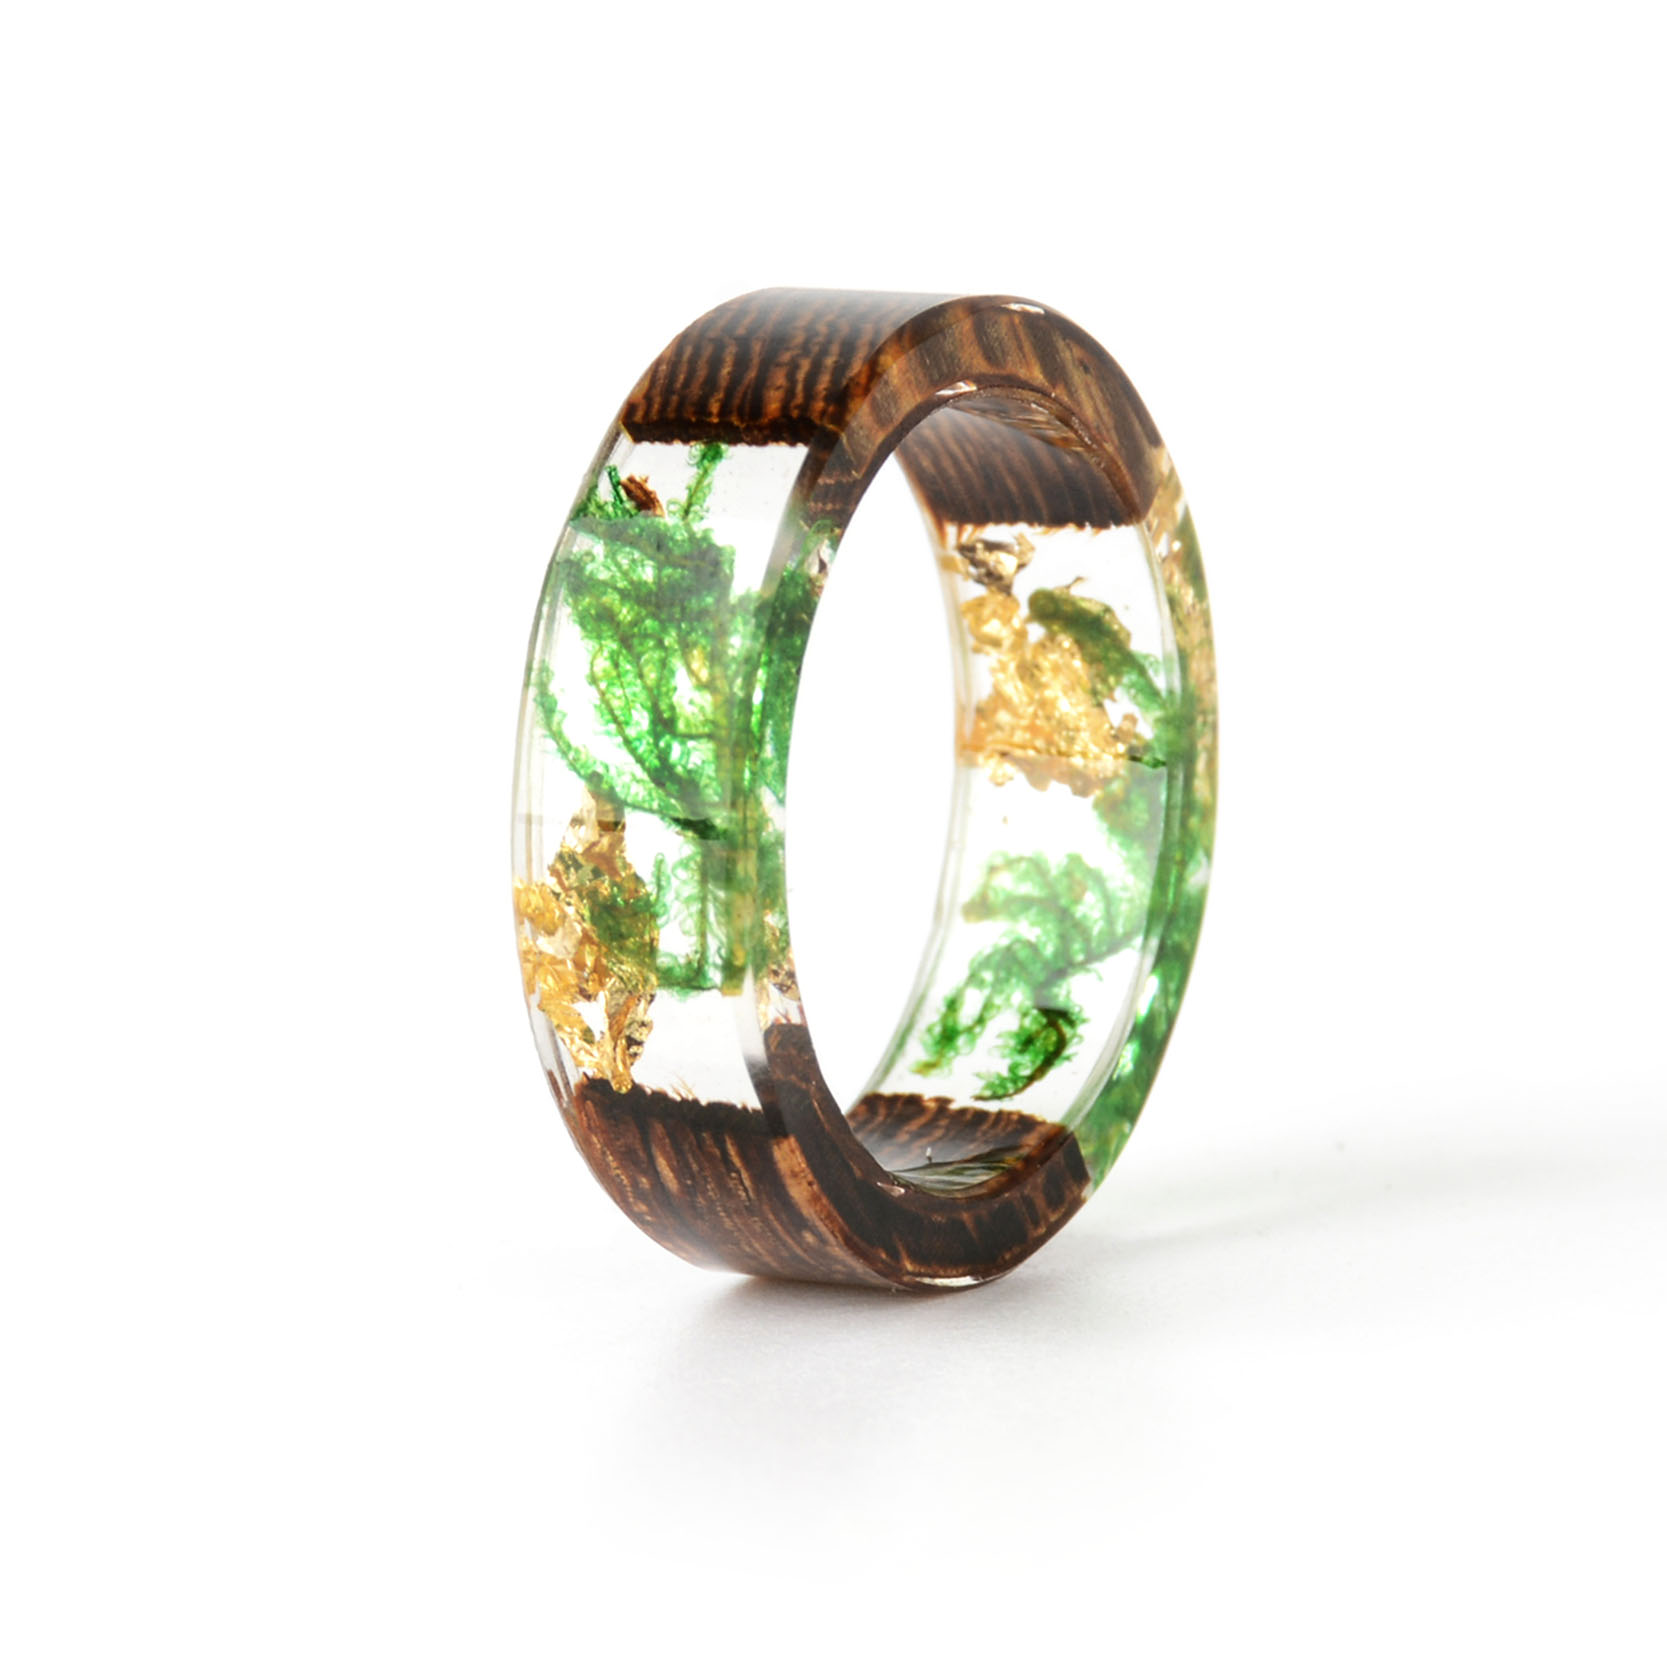 Handmade Wood Resin Ring Many Styles 28